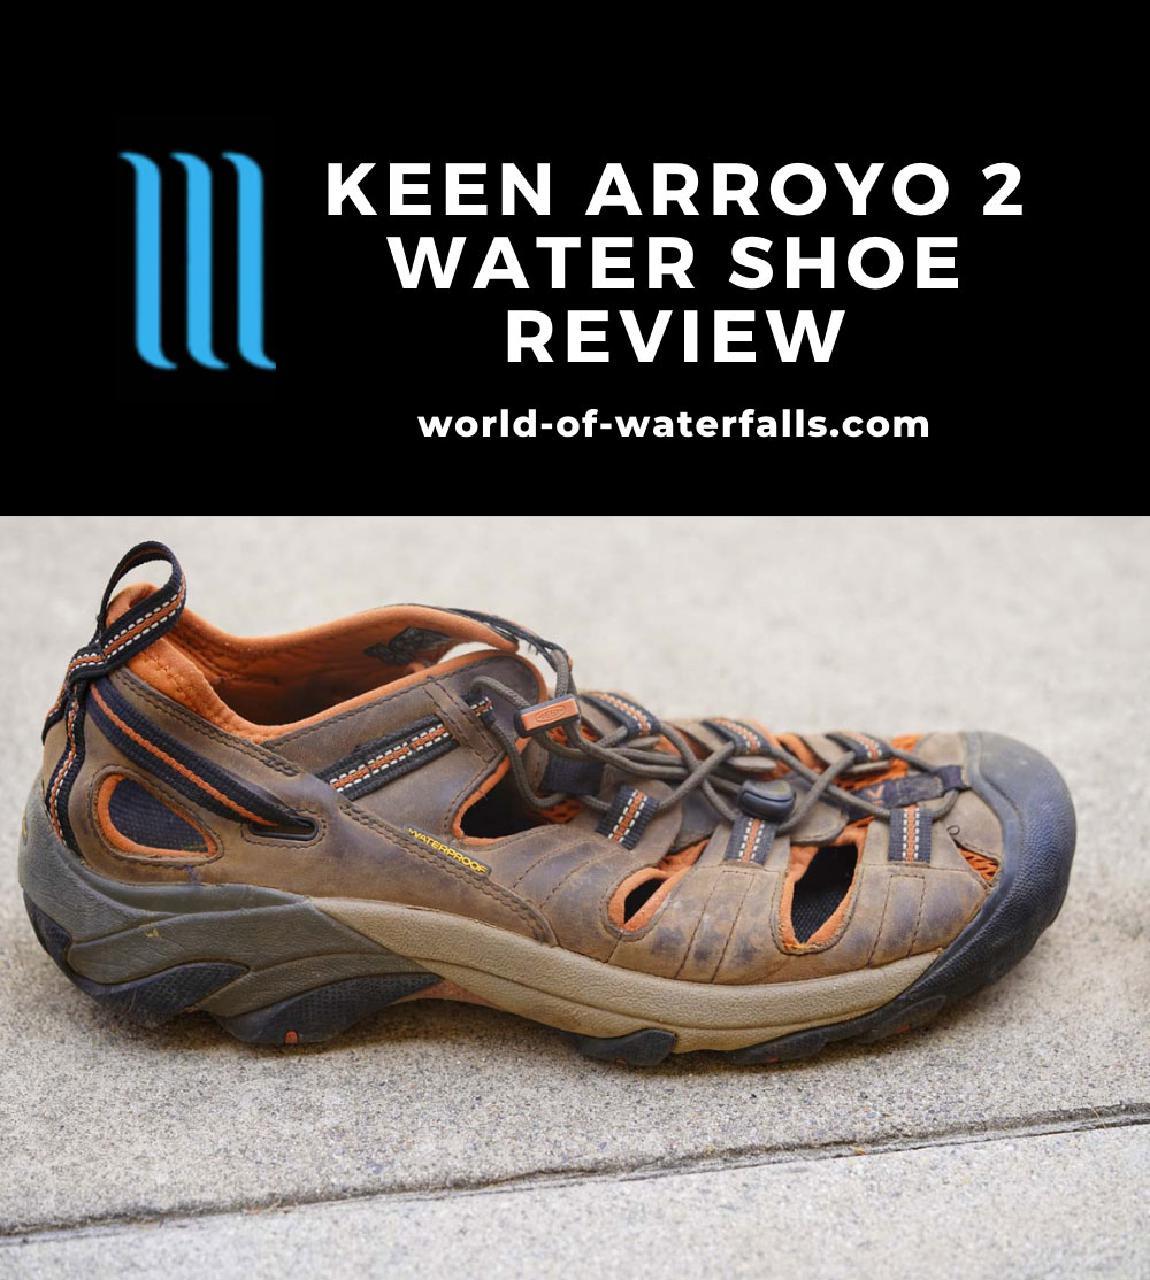 My worn Keen Arroyo II Waterproof Shoes